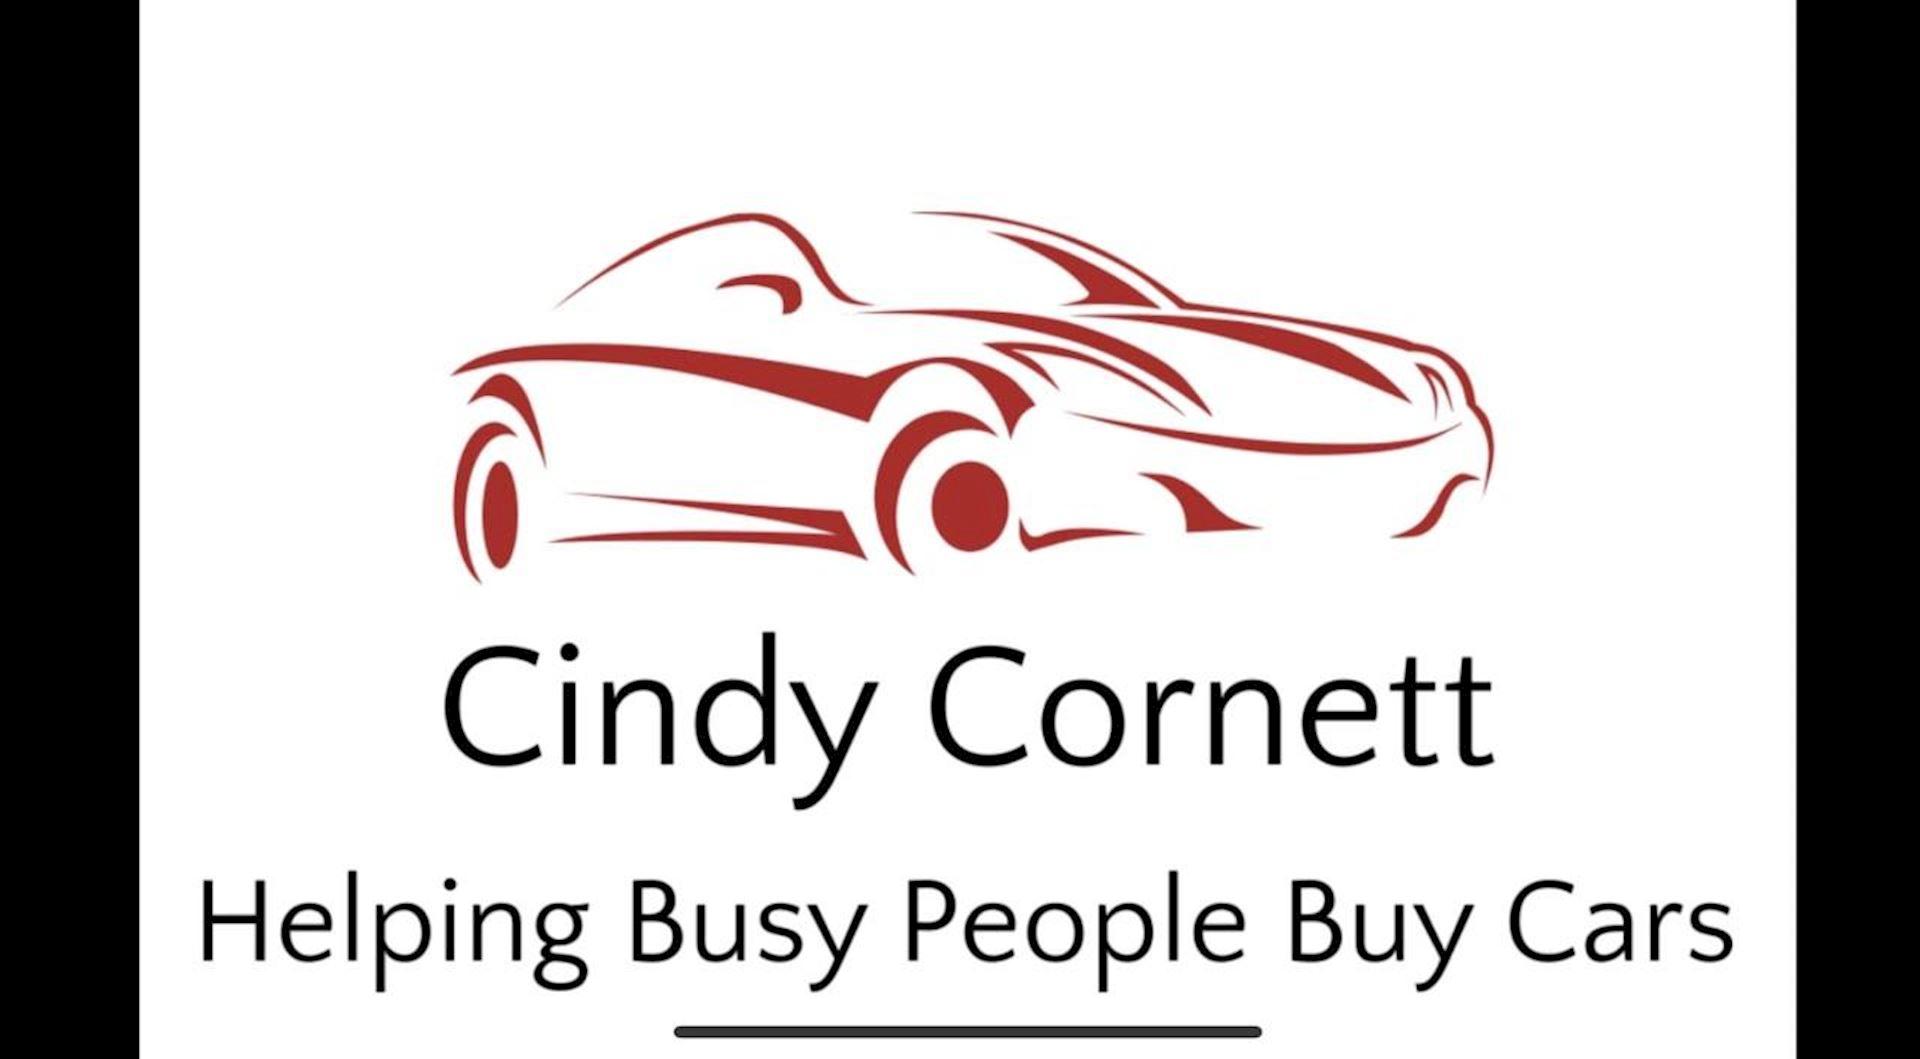 Cindy Cornett Cma S Colonial Chevrolet Chester Va